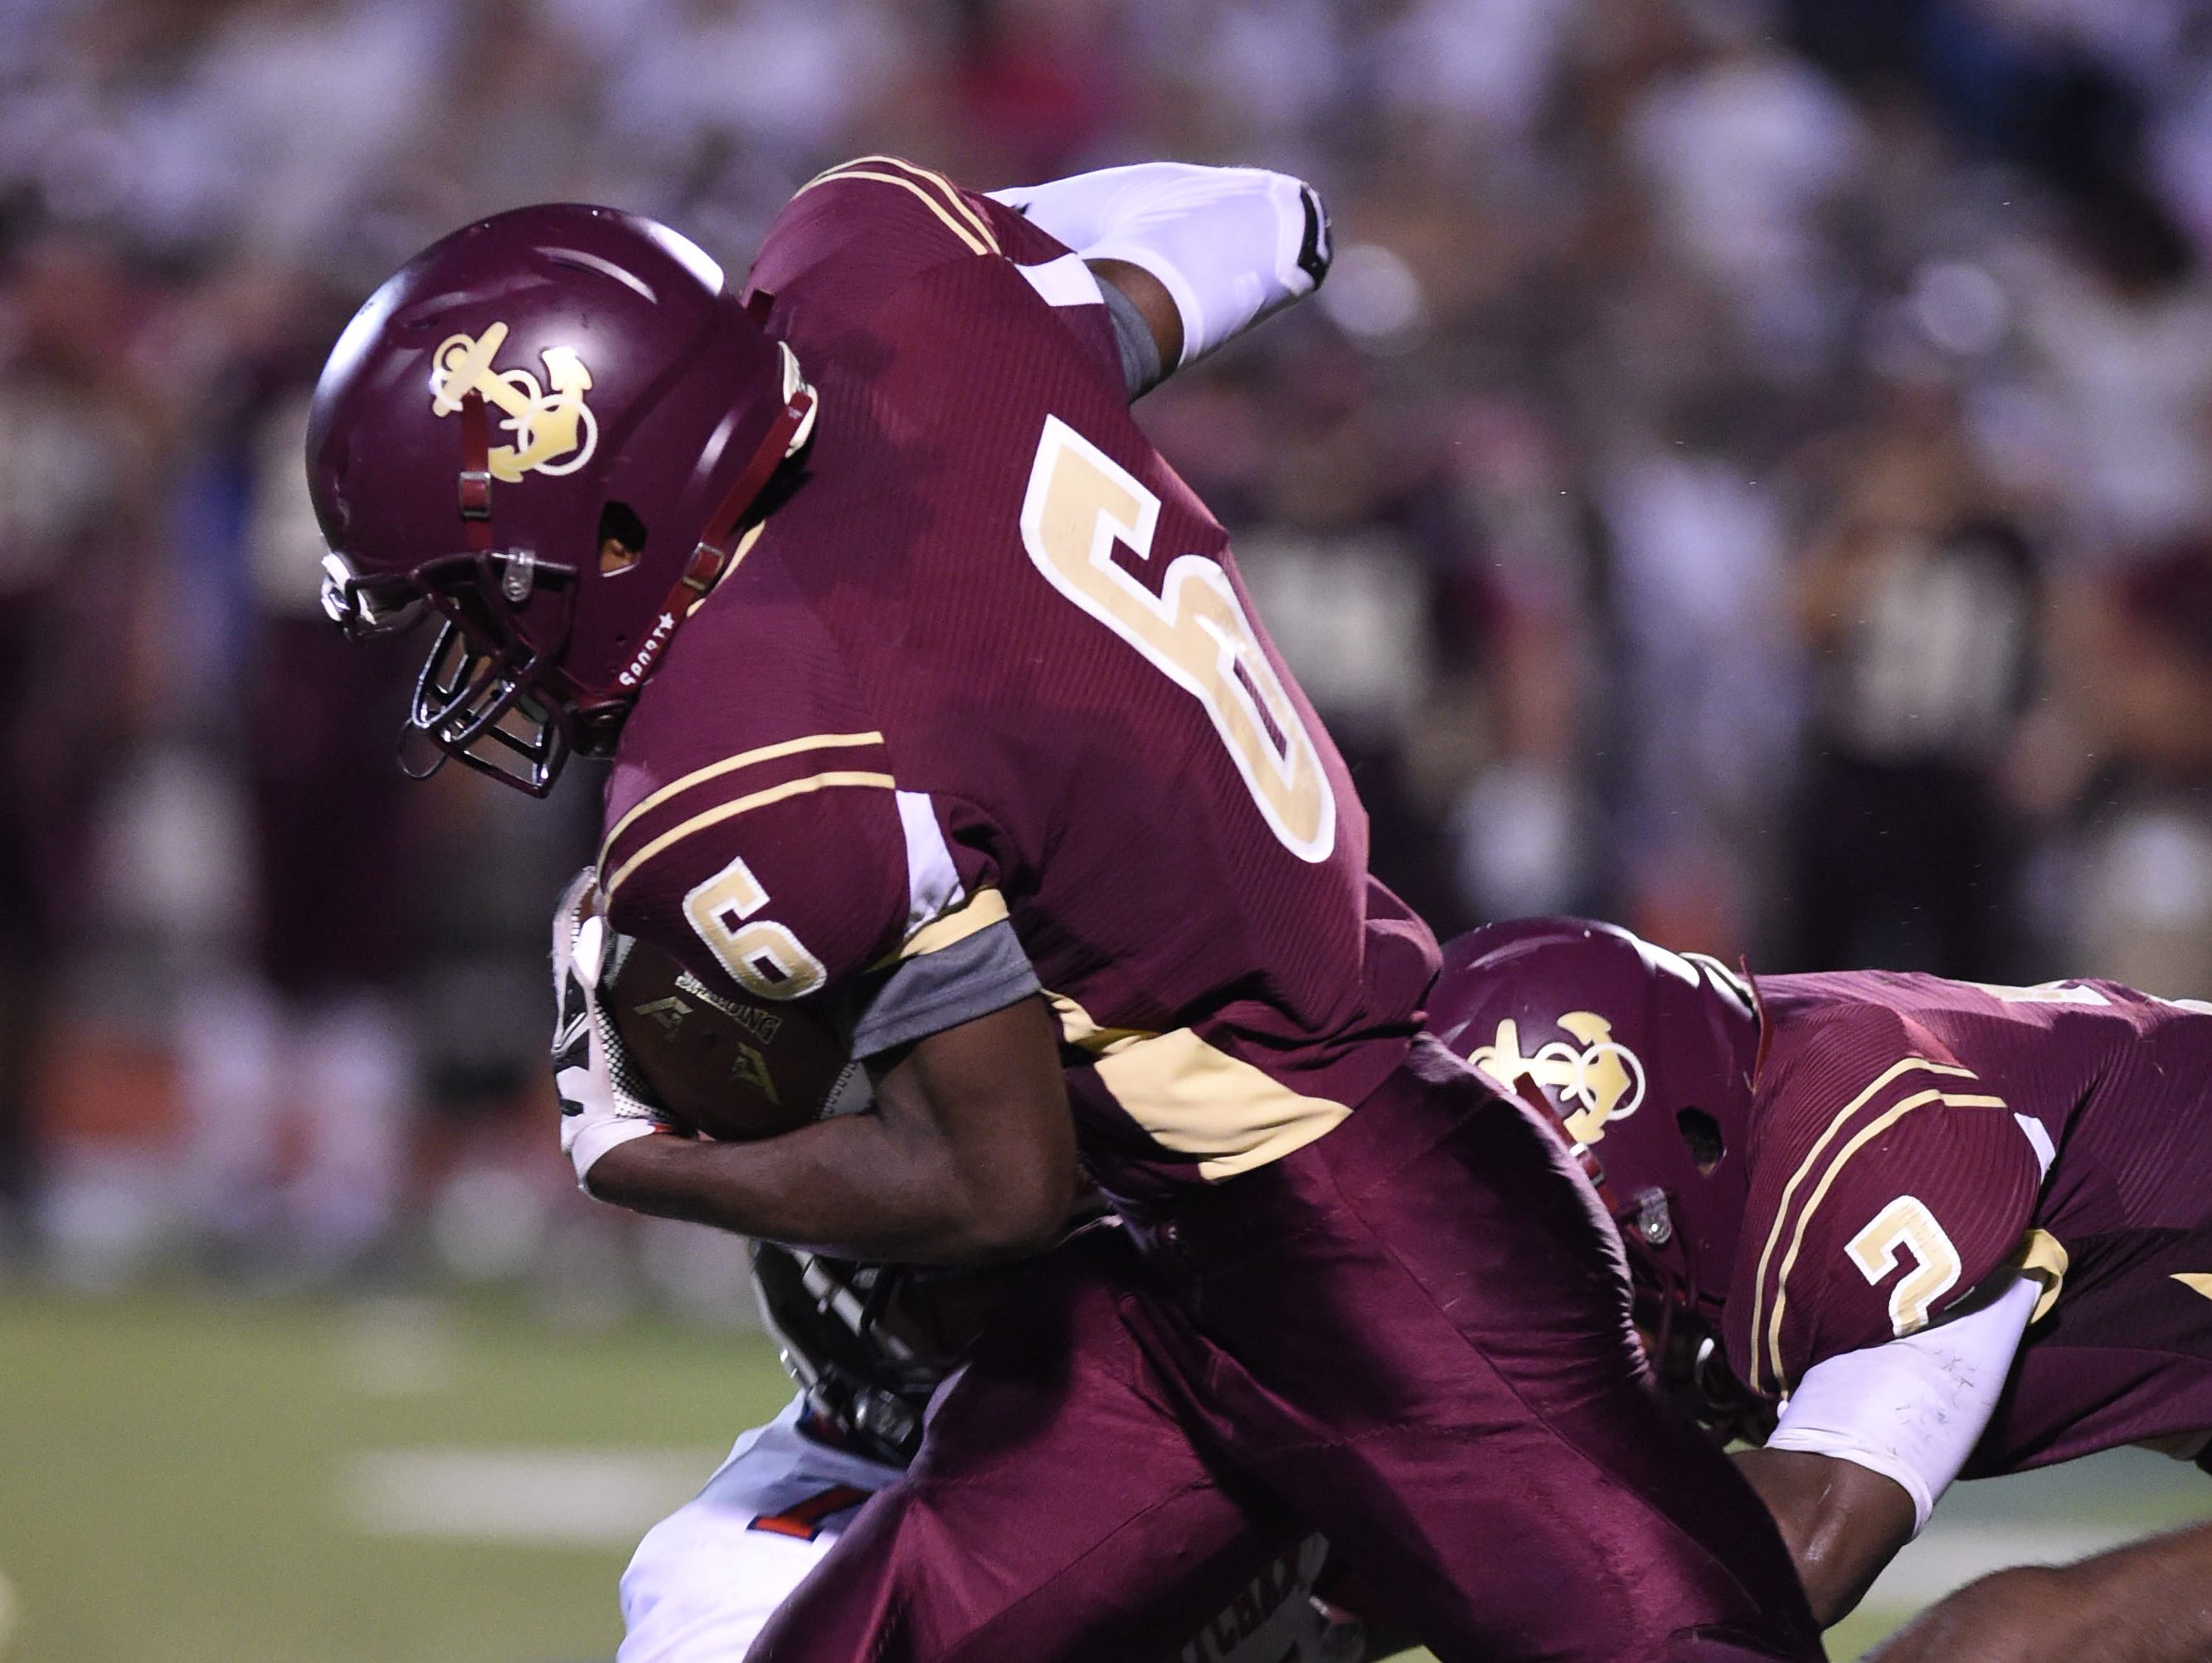 Ricardo Yolas has burst onto the scene just two games into the season for the Arlington High School football team.